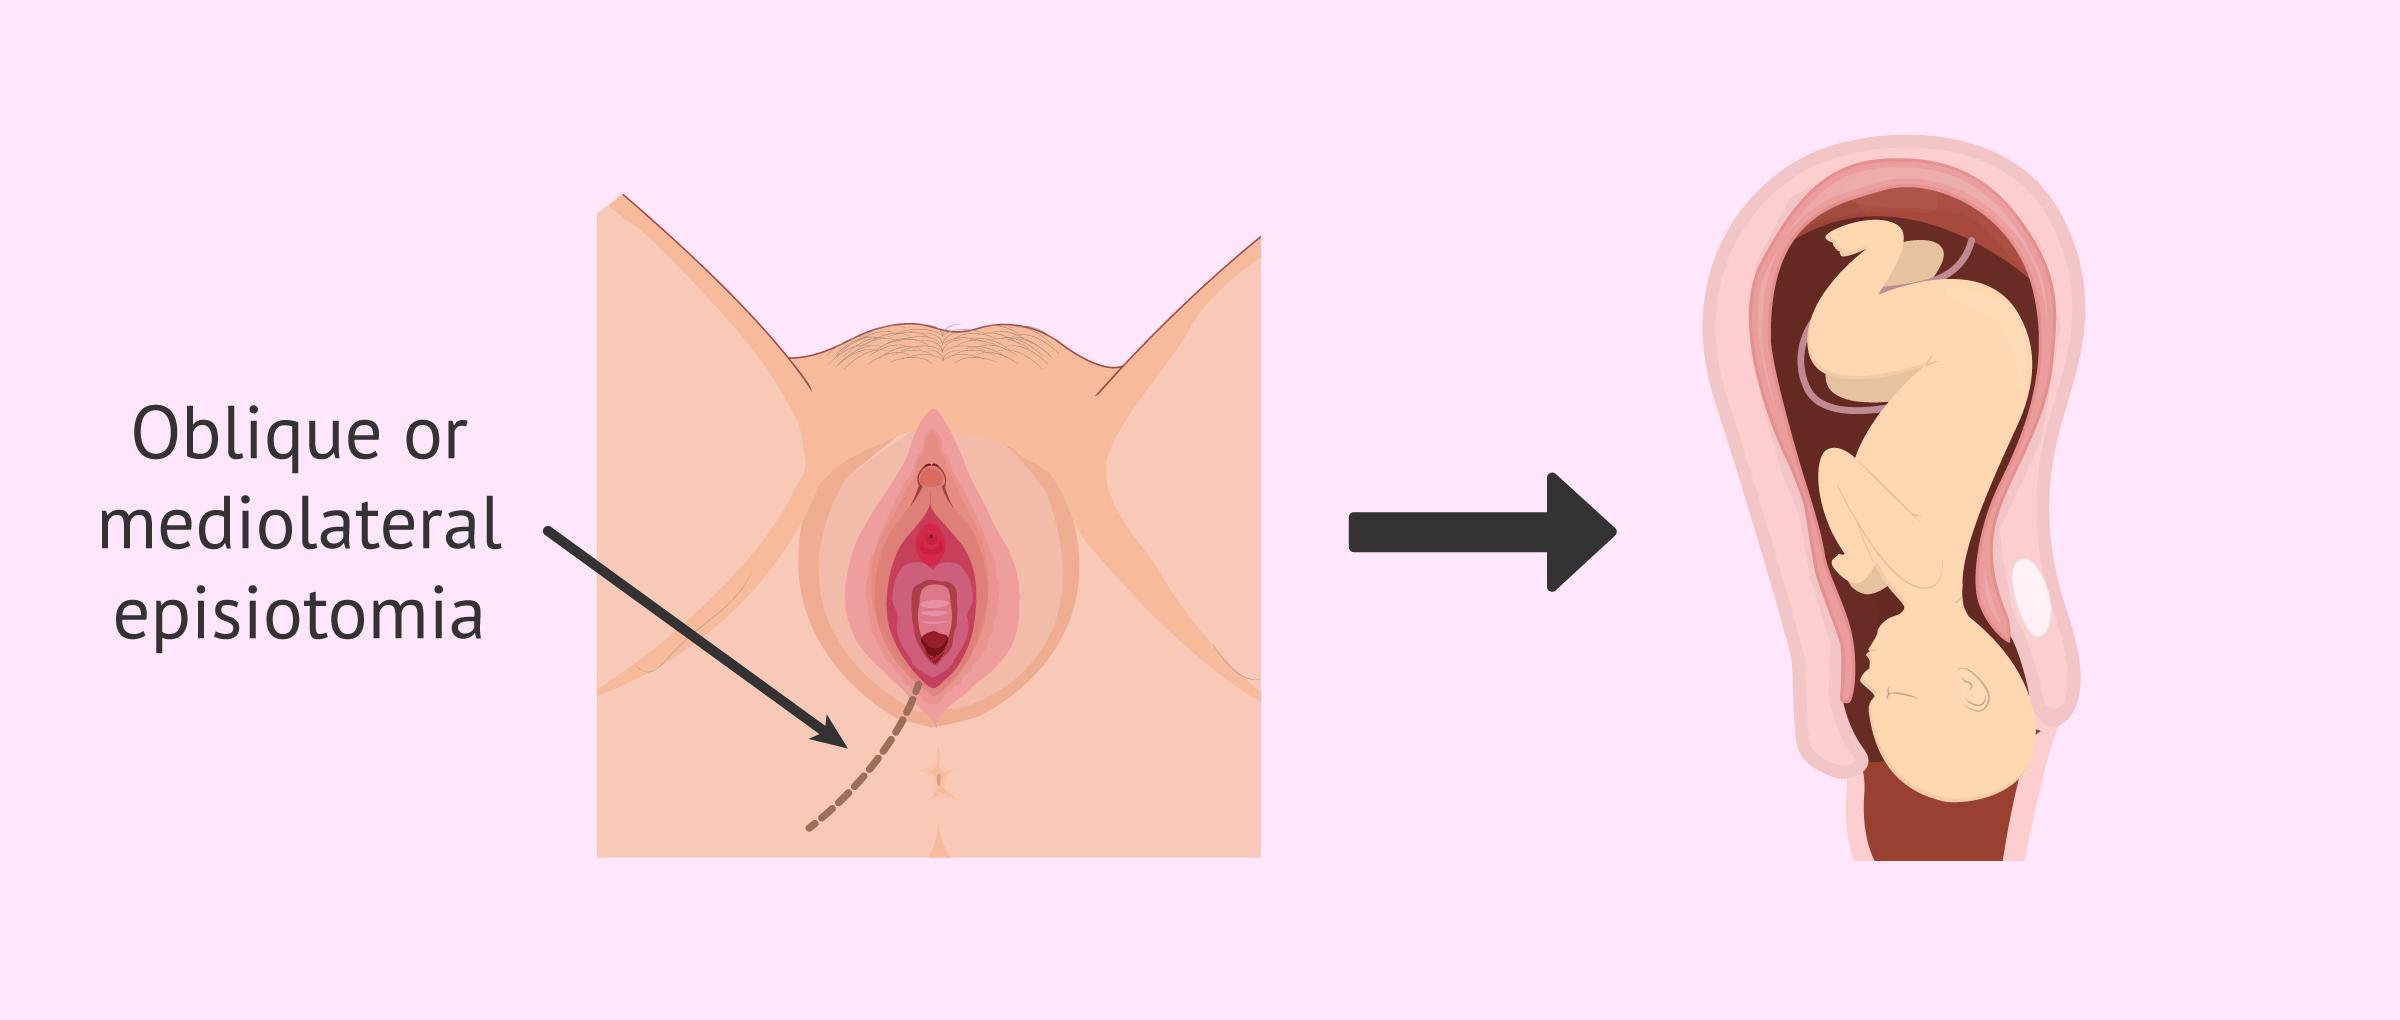 Imagen: Episiotomy for facilitating labor